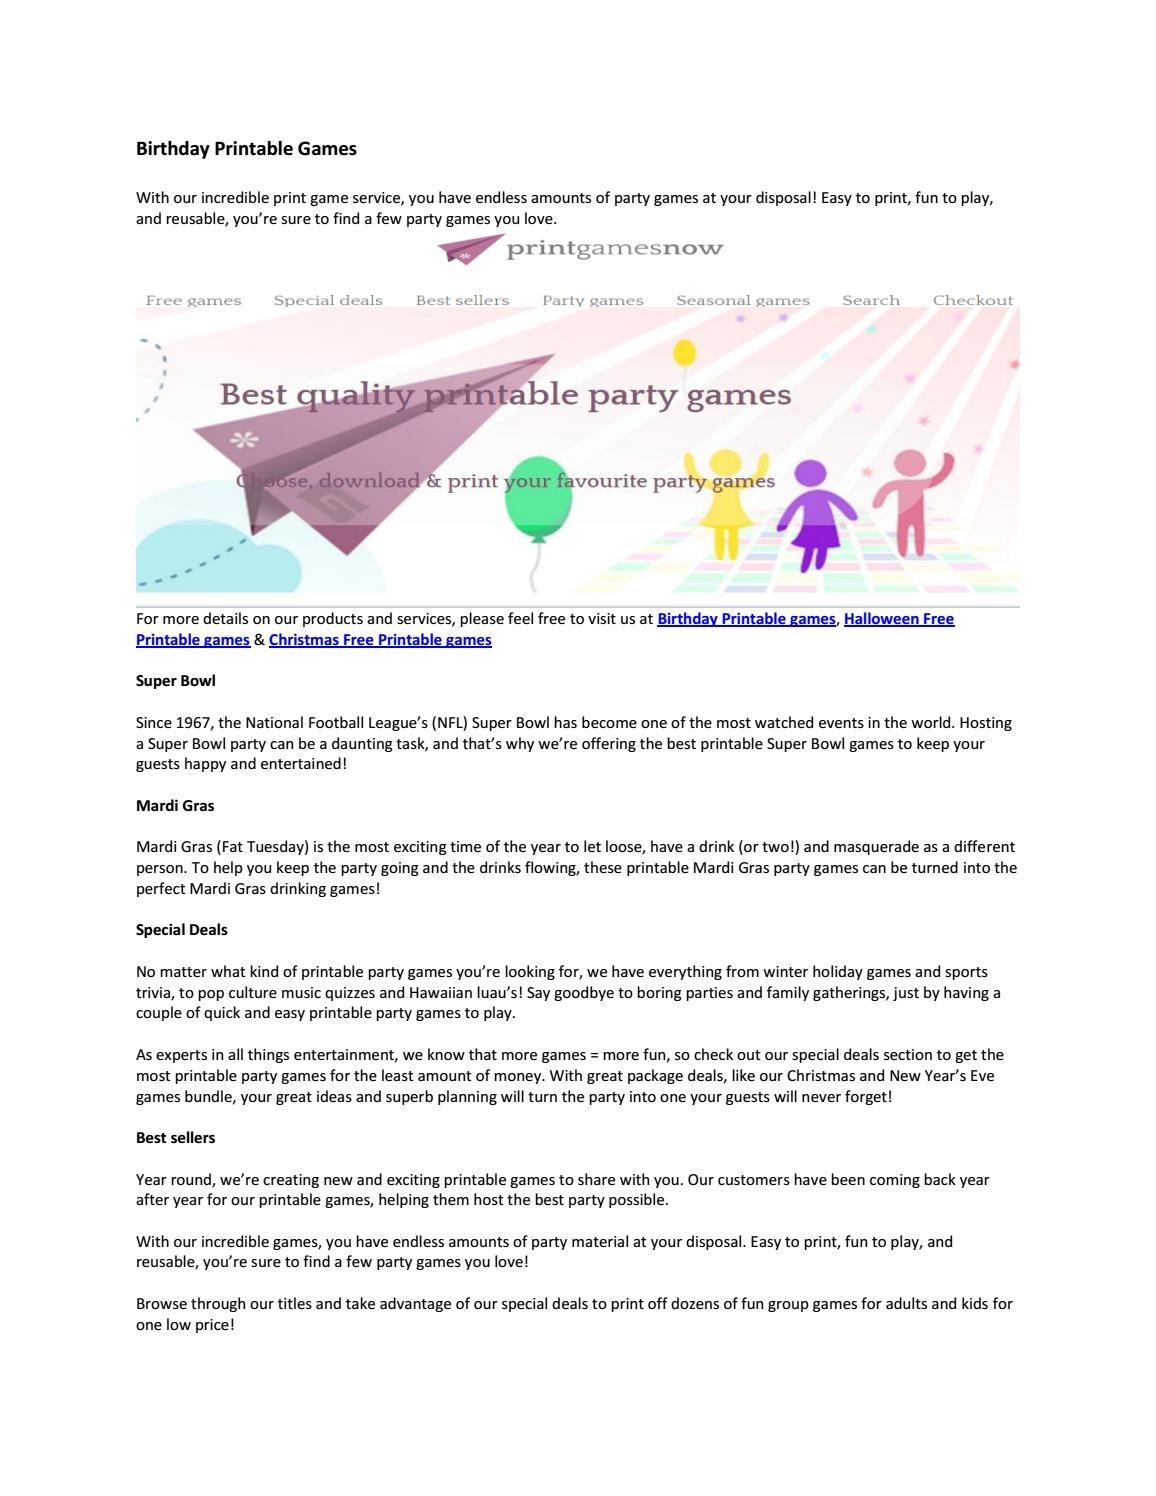 Birthday Printable Gamesprintgamesnow - Issuu - Free Printable Mardi Gras Games